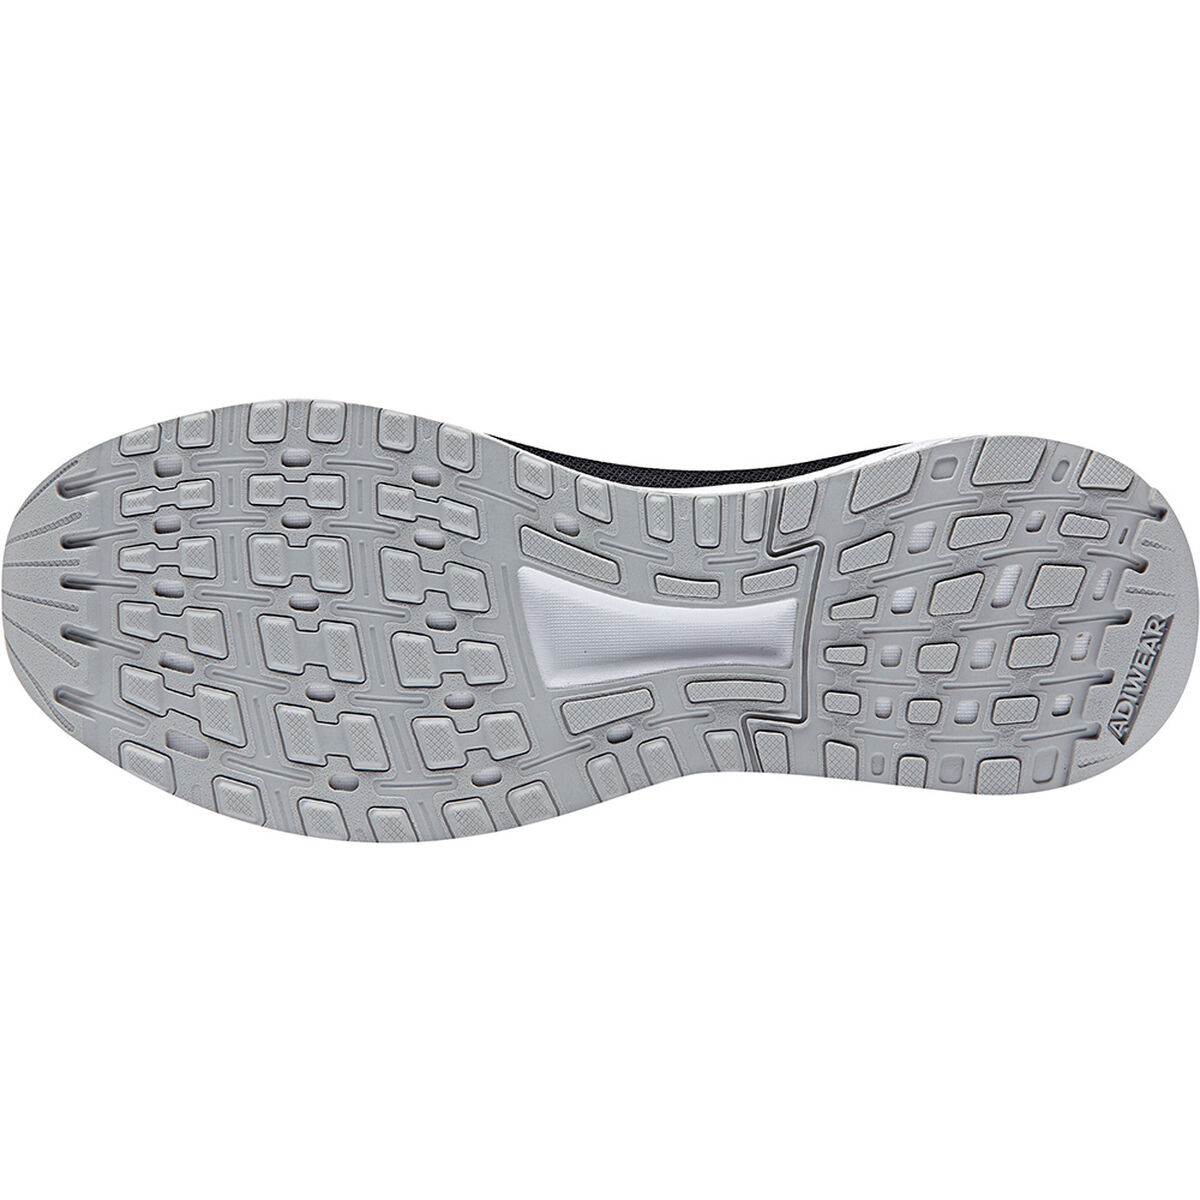 Zapatilla Adidas Mujer Duramo 9